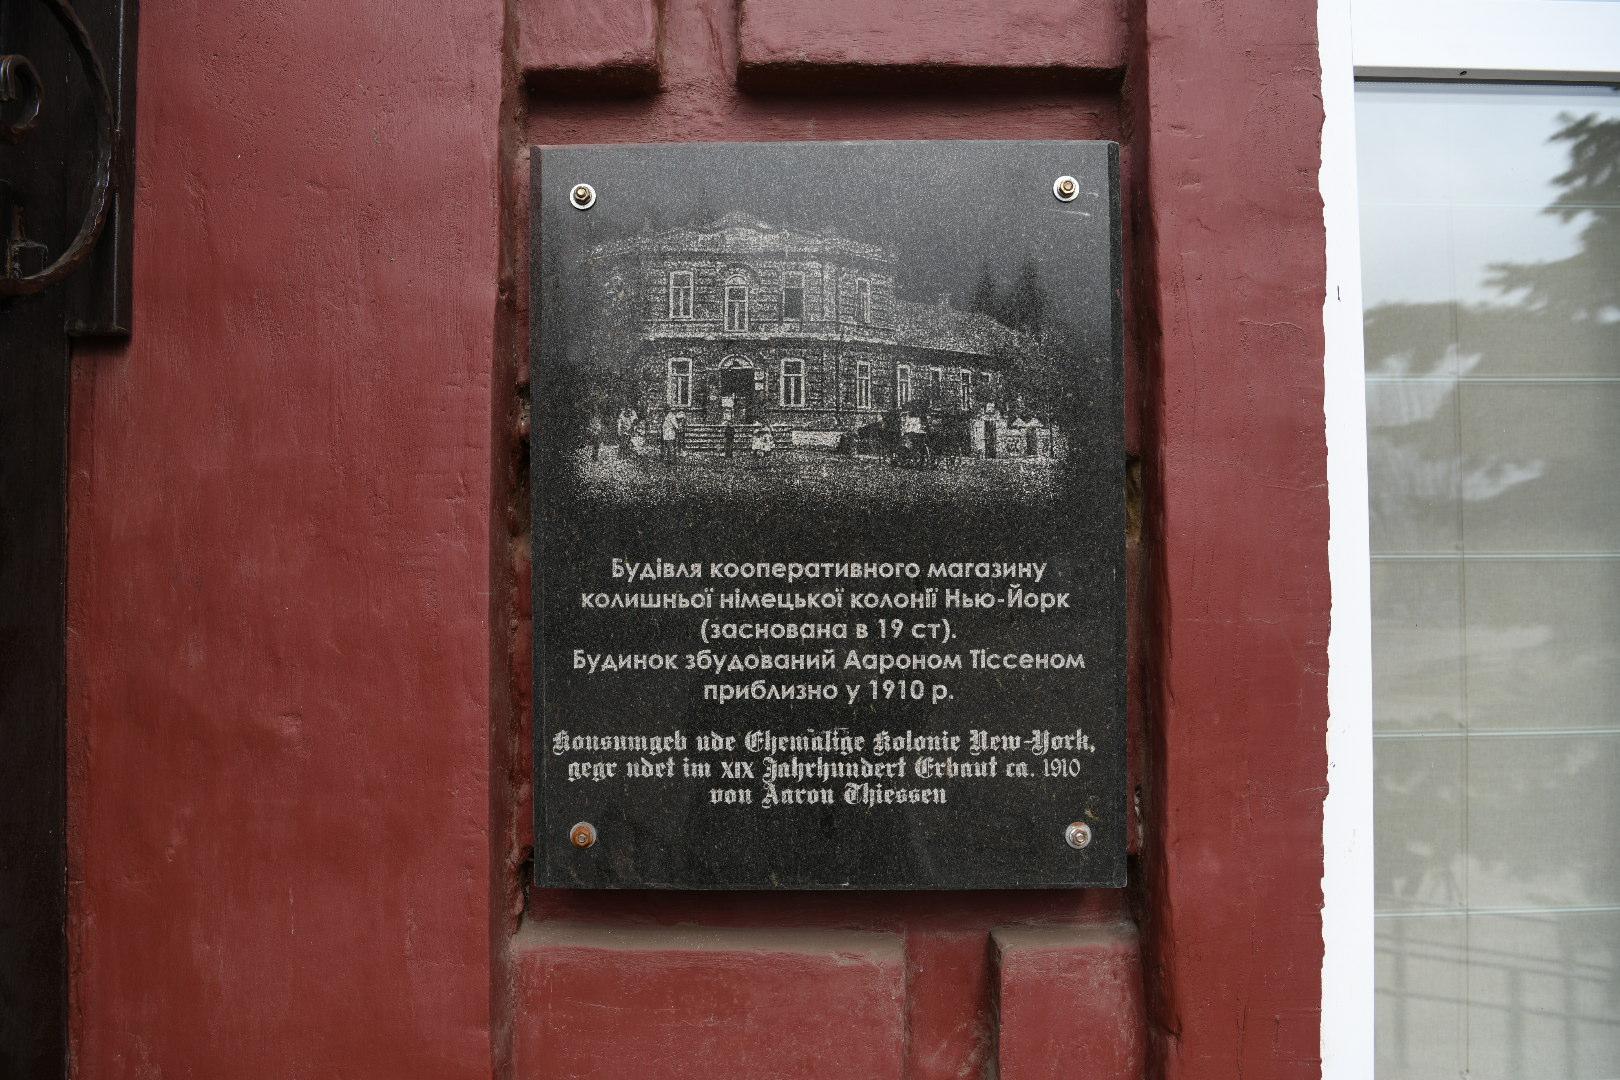 Український Нью-Йорк хаб